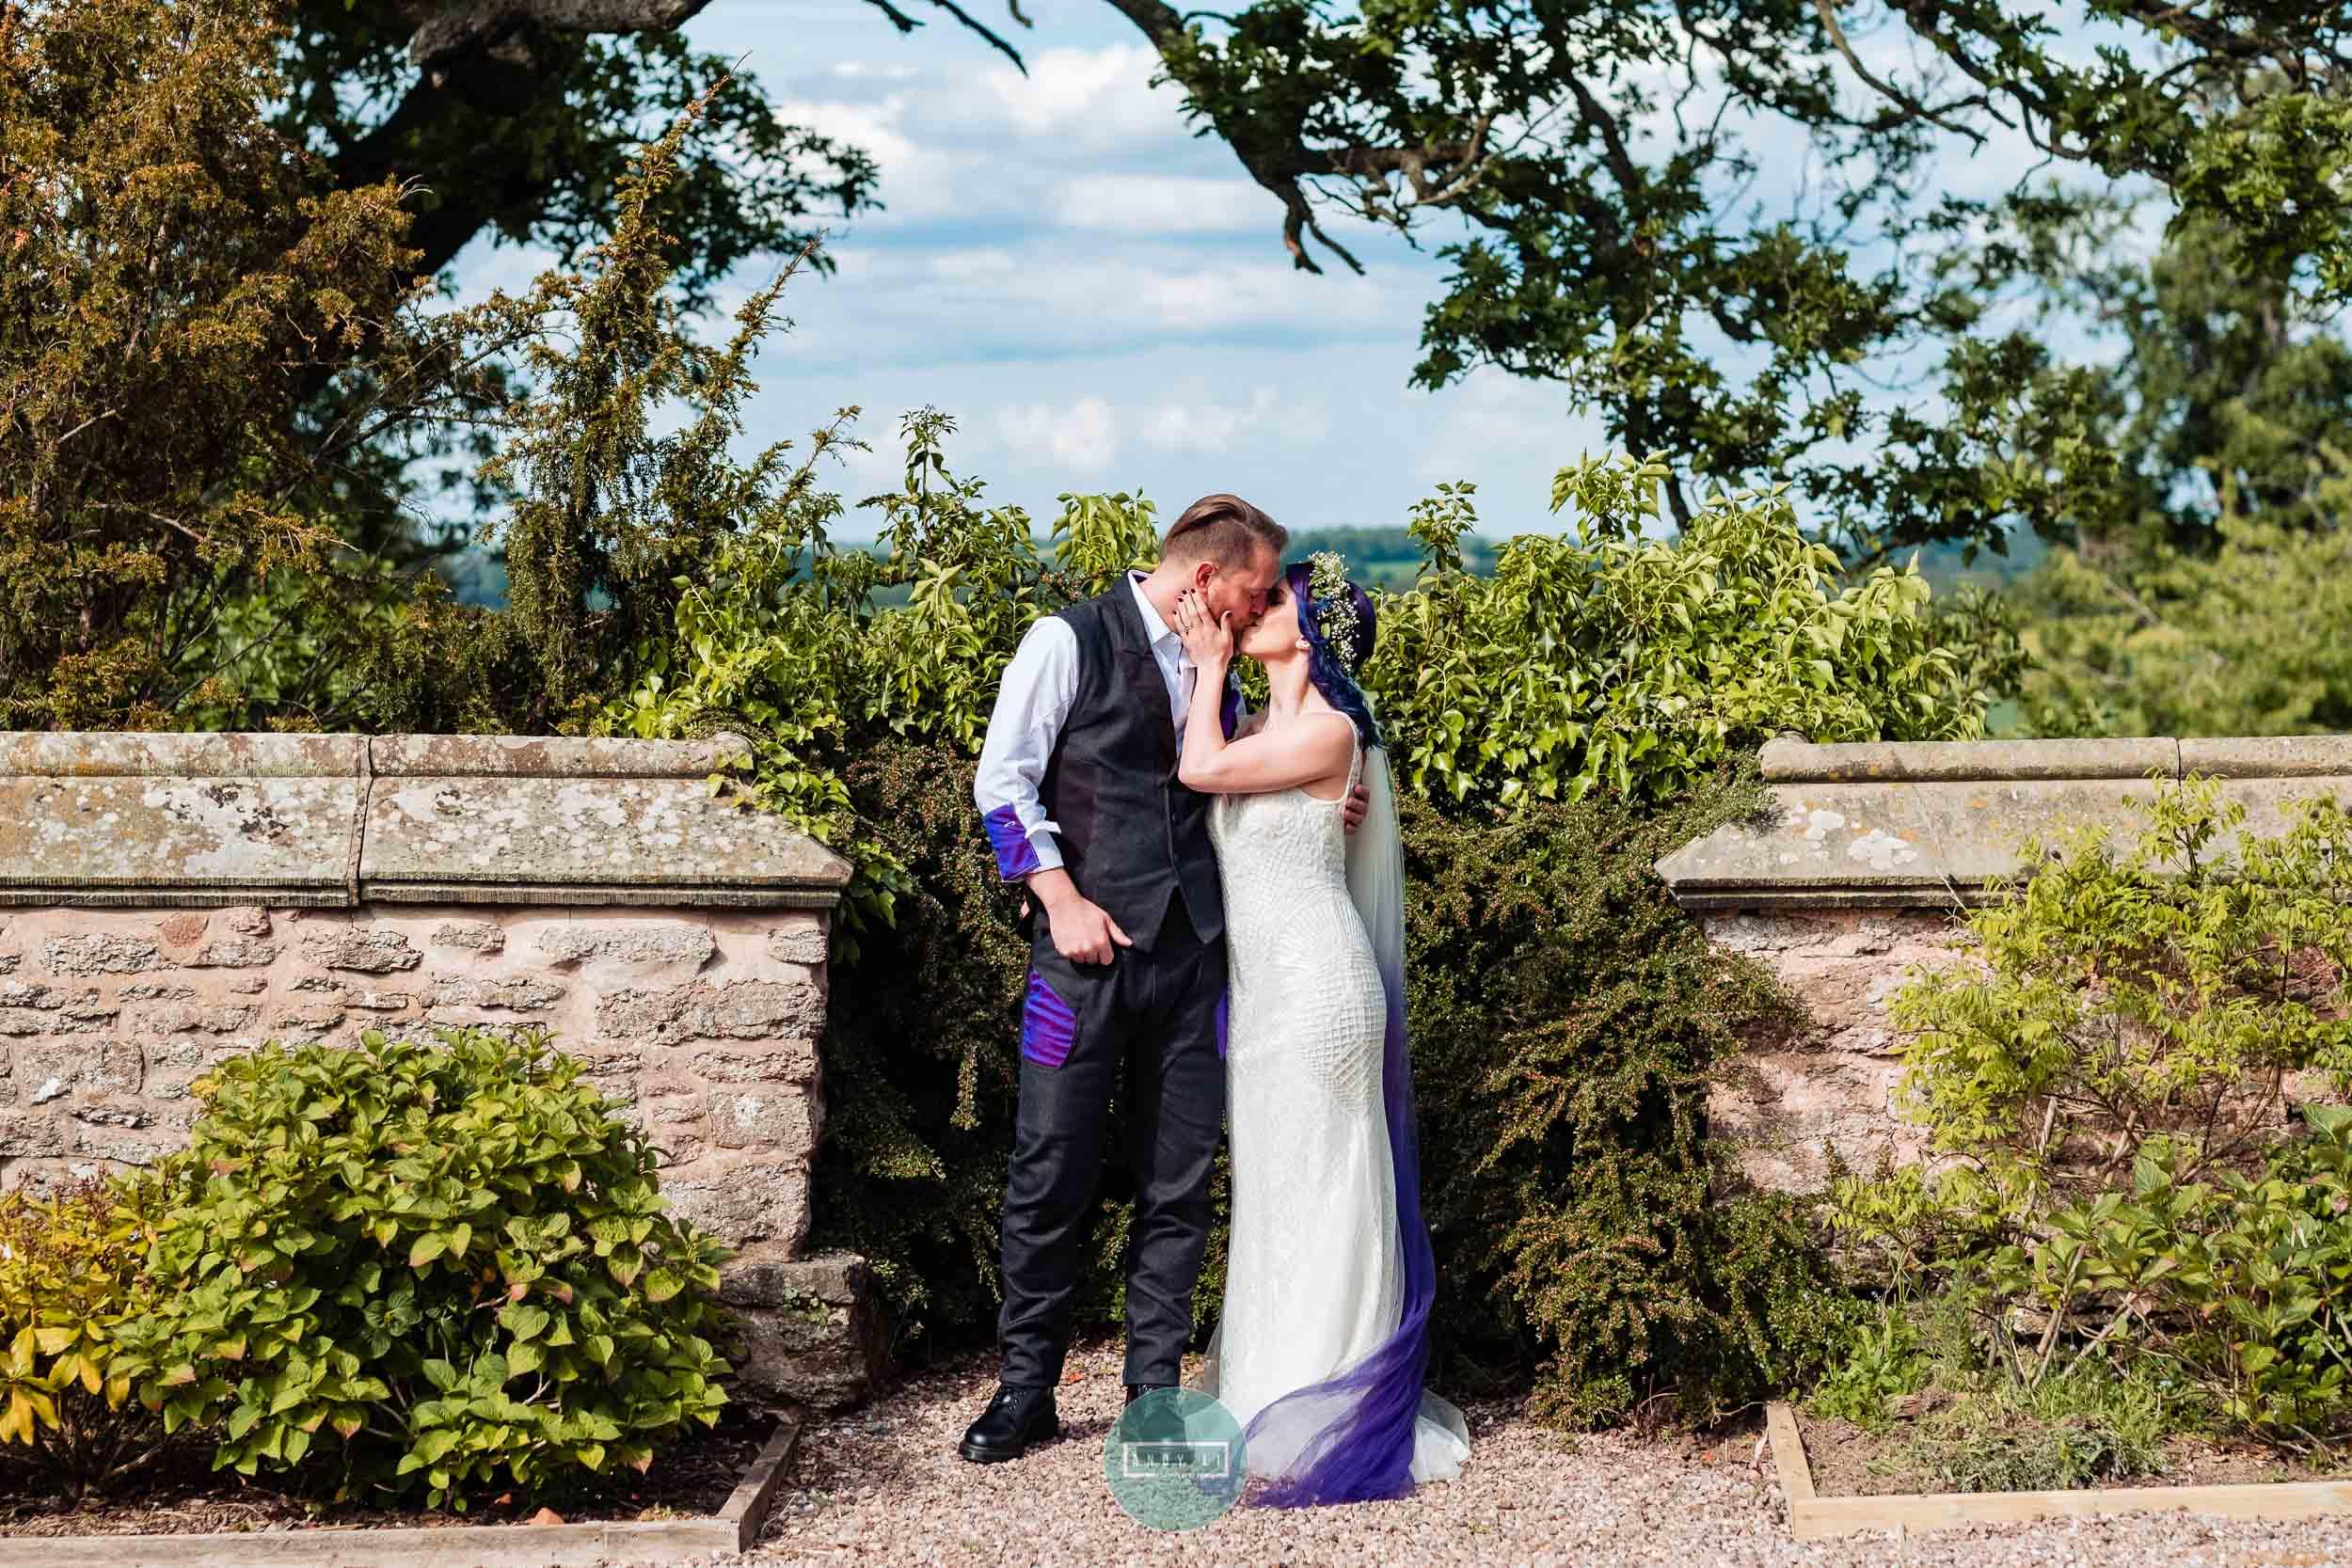 Rowton Castle Wedding Photographer-058-XPRO4178.jpg